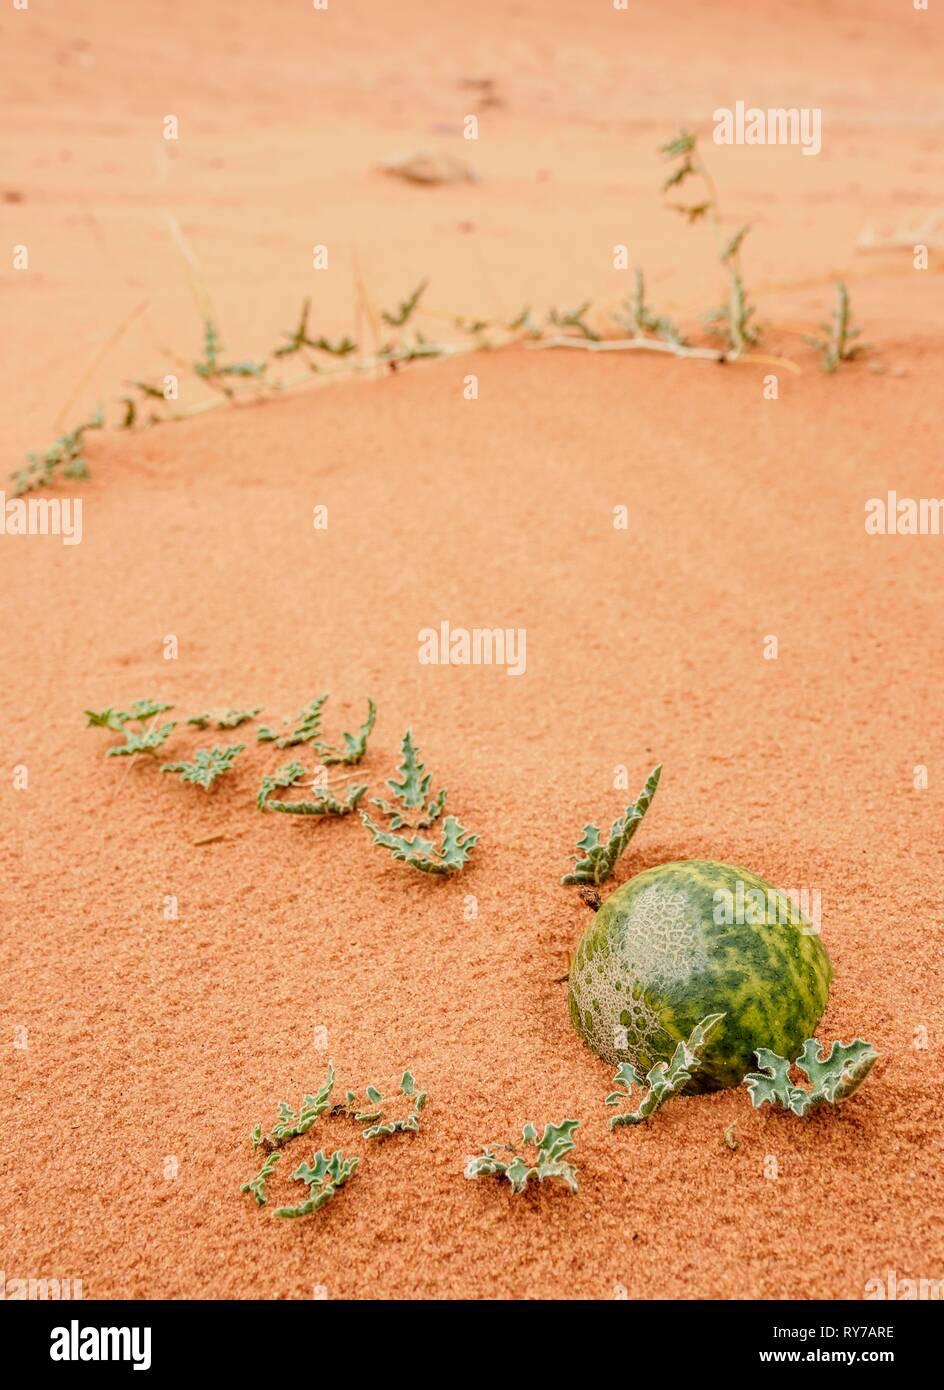 Al Handal, Bitter Apple (Citrullus colocynthis), Wadi Rum, Aqaba Governorate, Jordan - Stock Image